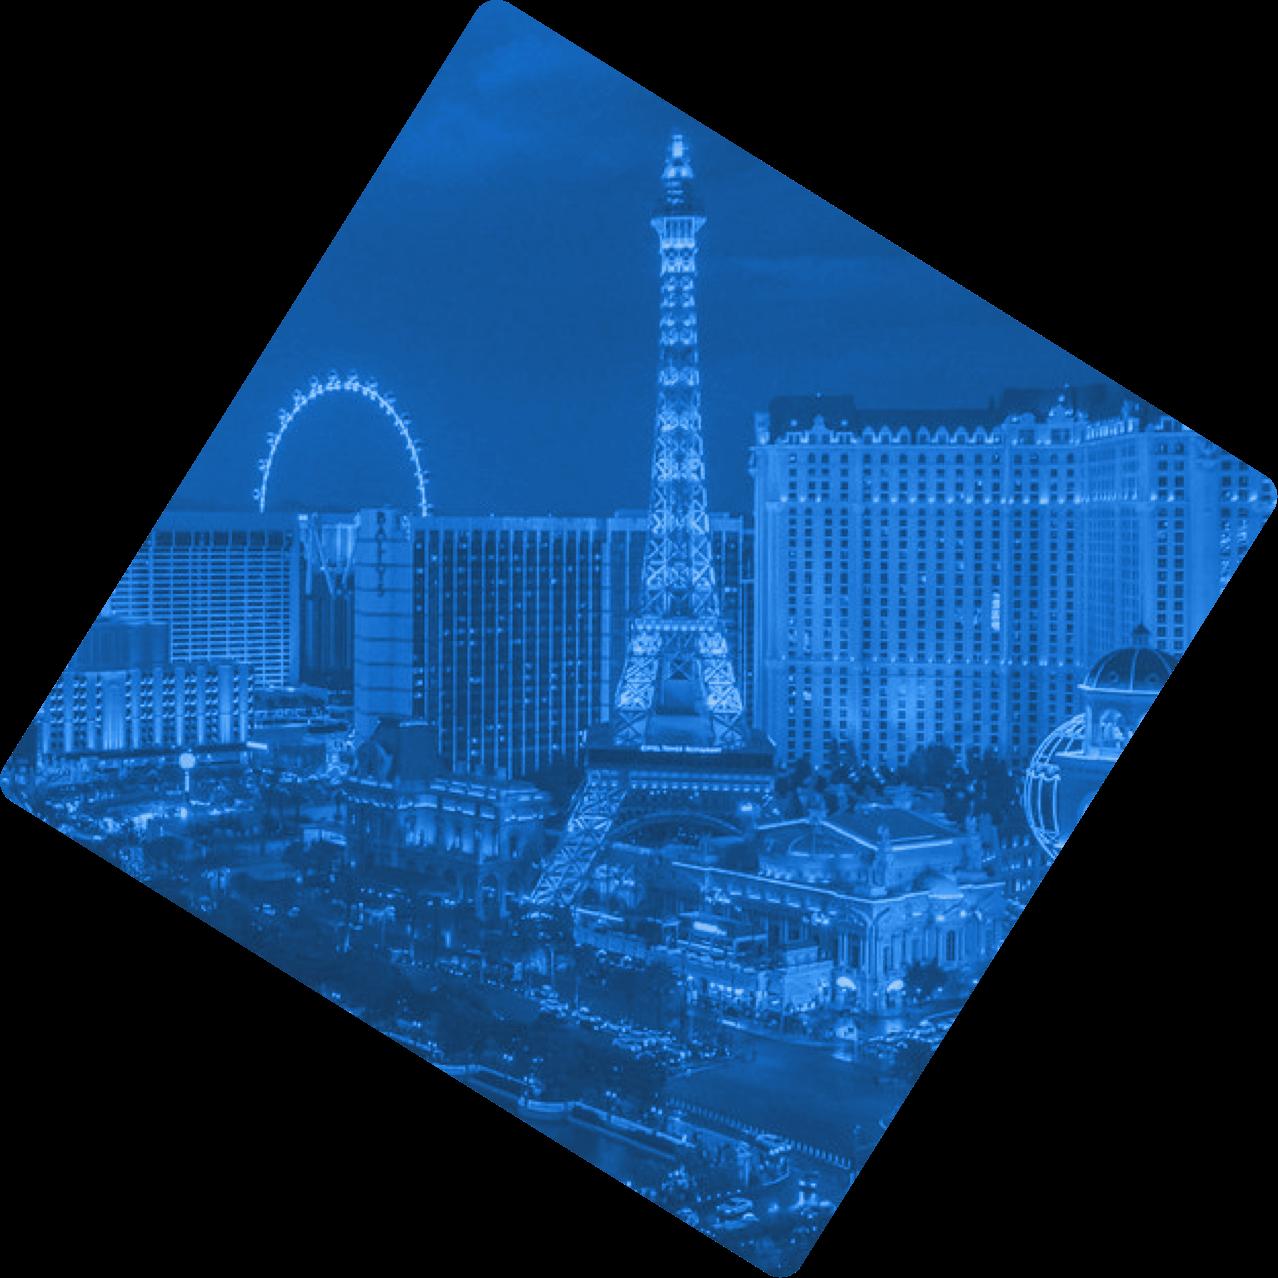 Overhead view of Las Vegas